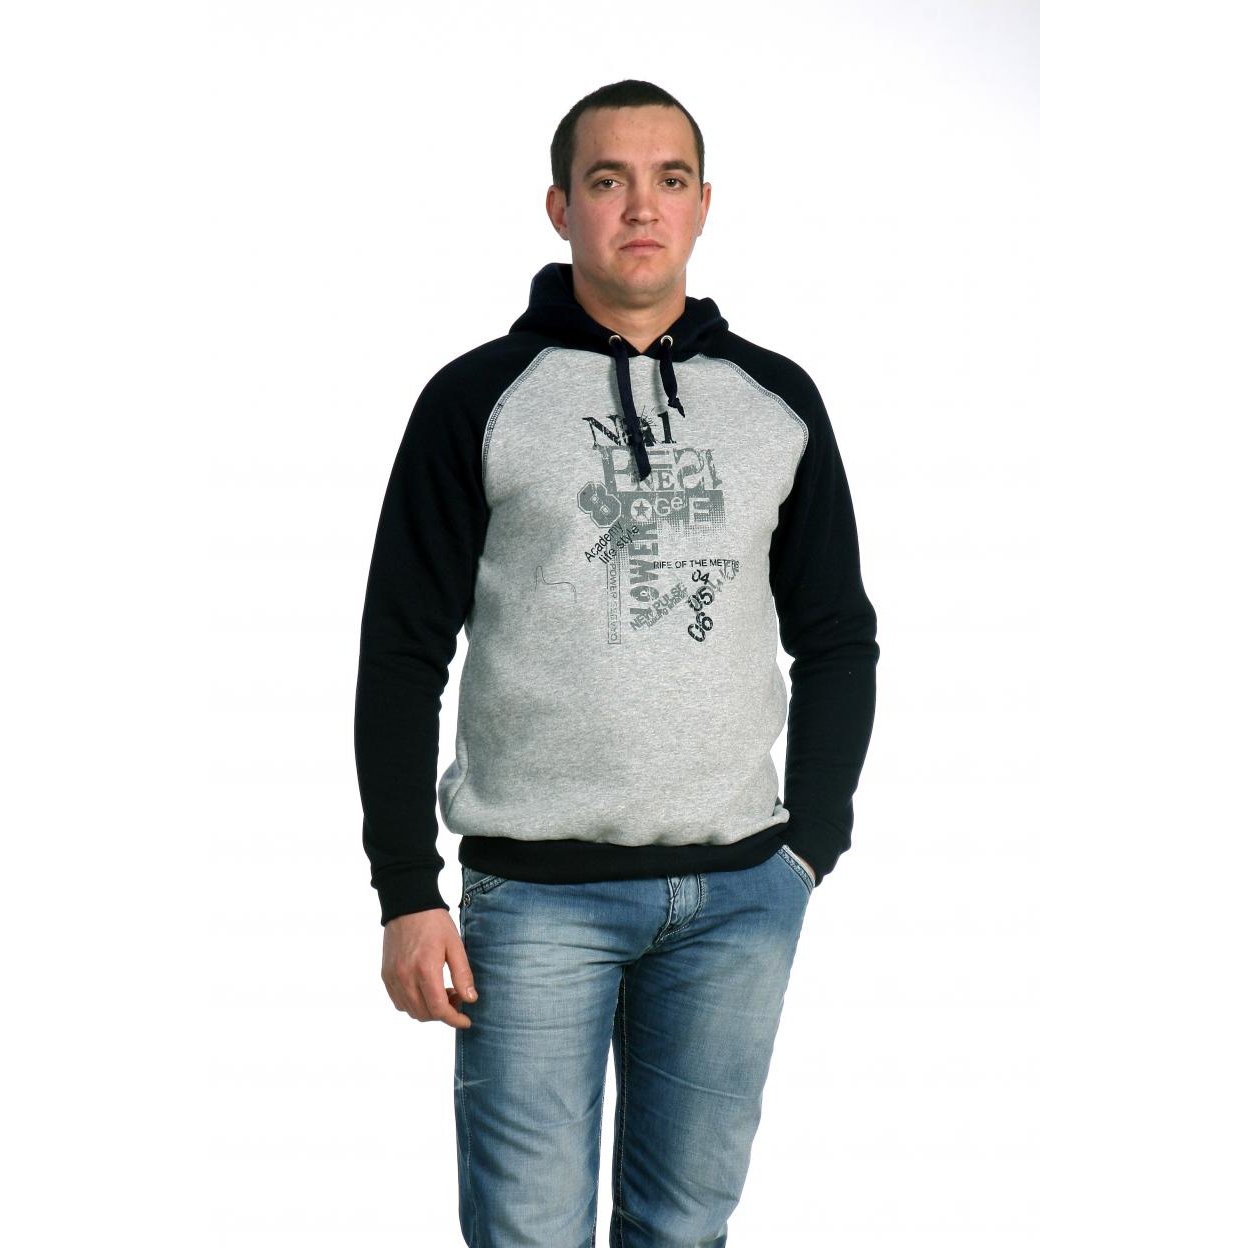 Мужская толстовка «Эван», размер 52Толстовки, джемпера и рубашки<br>Обхват груди:104 см<br>Обхват талии:96 см<br>Обхват бедер:108 см<br>Рост:176-182 см<br><br>Тип: Муж. толстовка<br>Размер: 52<br>Материал: Футер